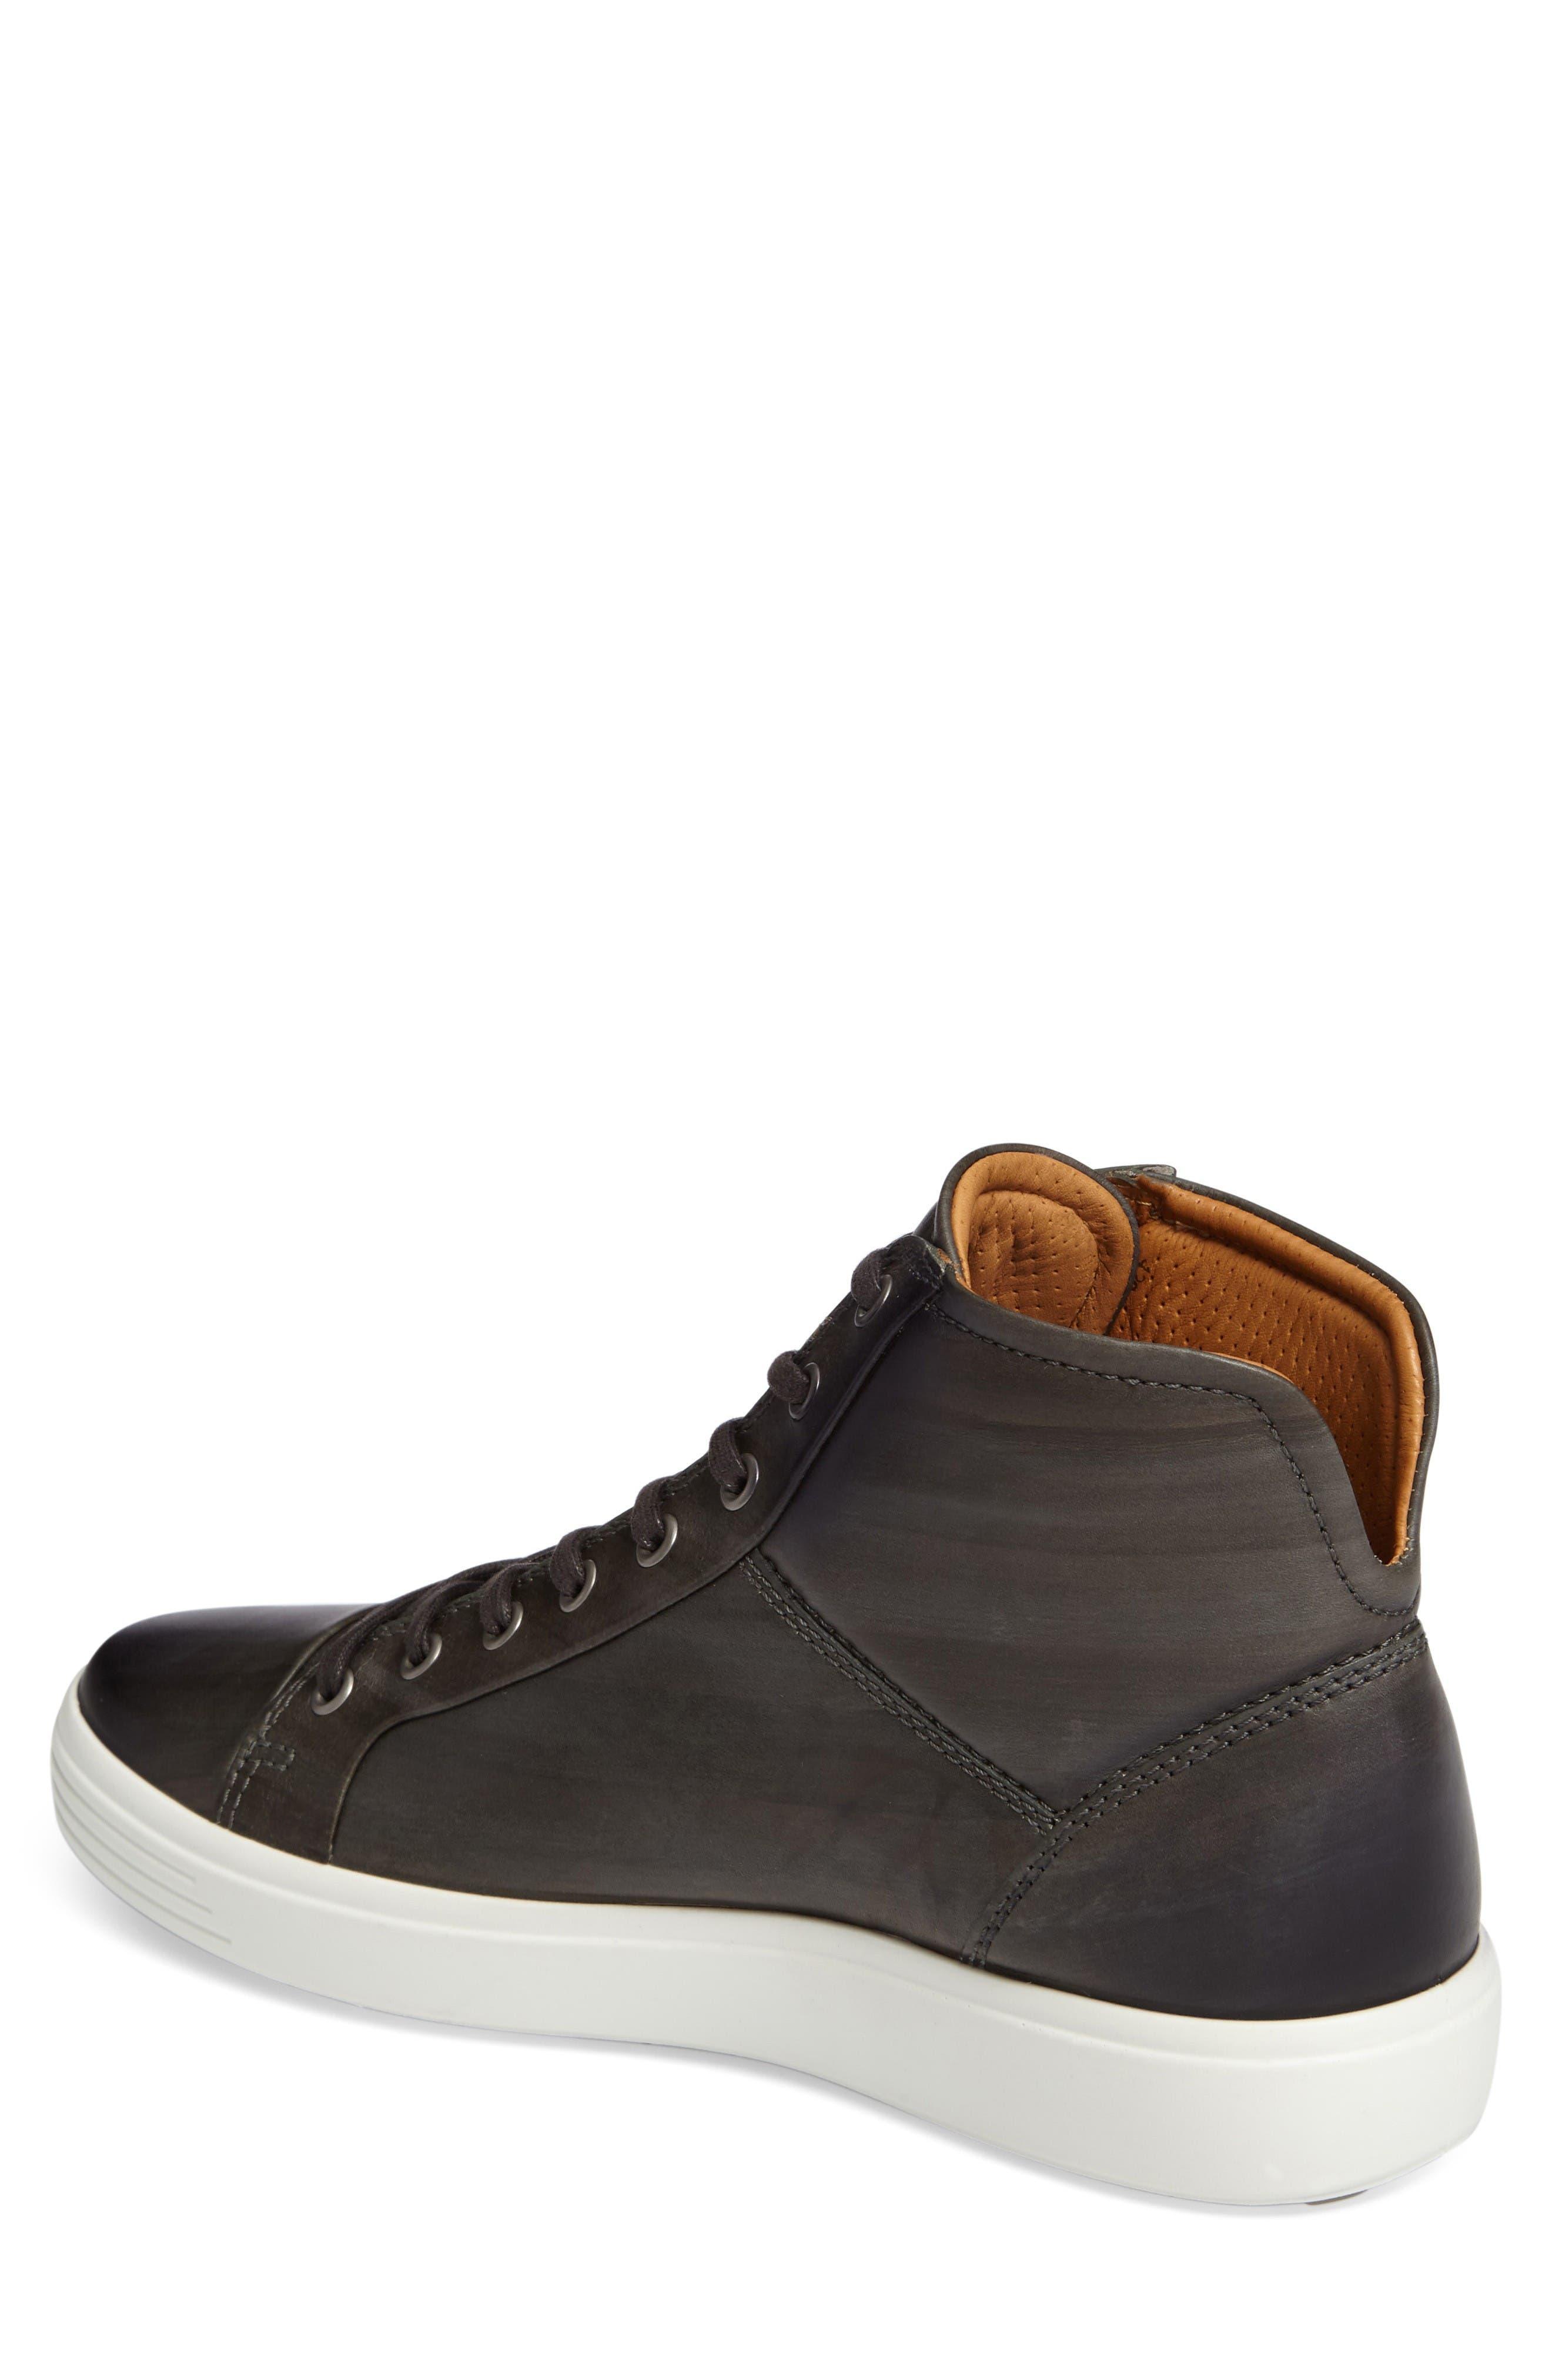 Soft 7 High Top Sneaker,                             Alternate thumbnail 2, color,                             Forrest